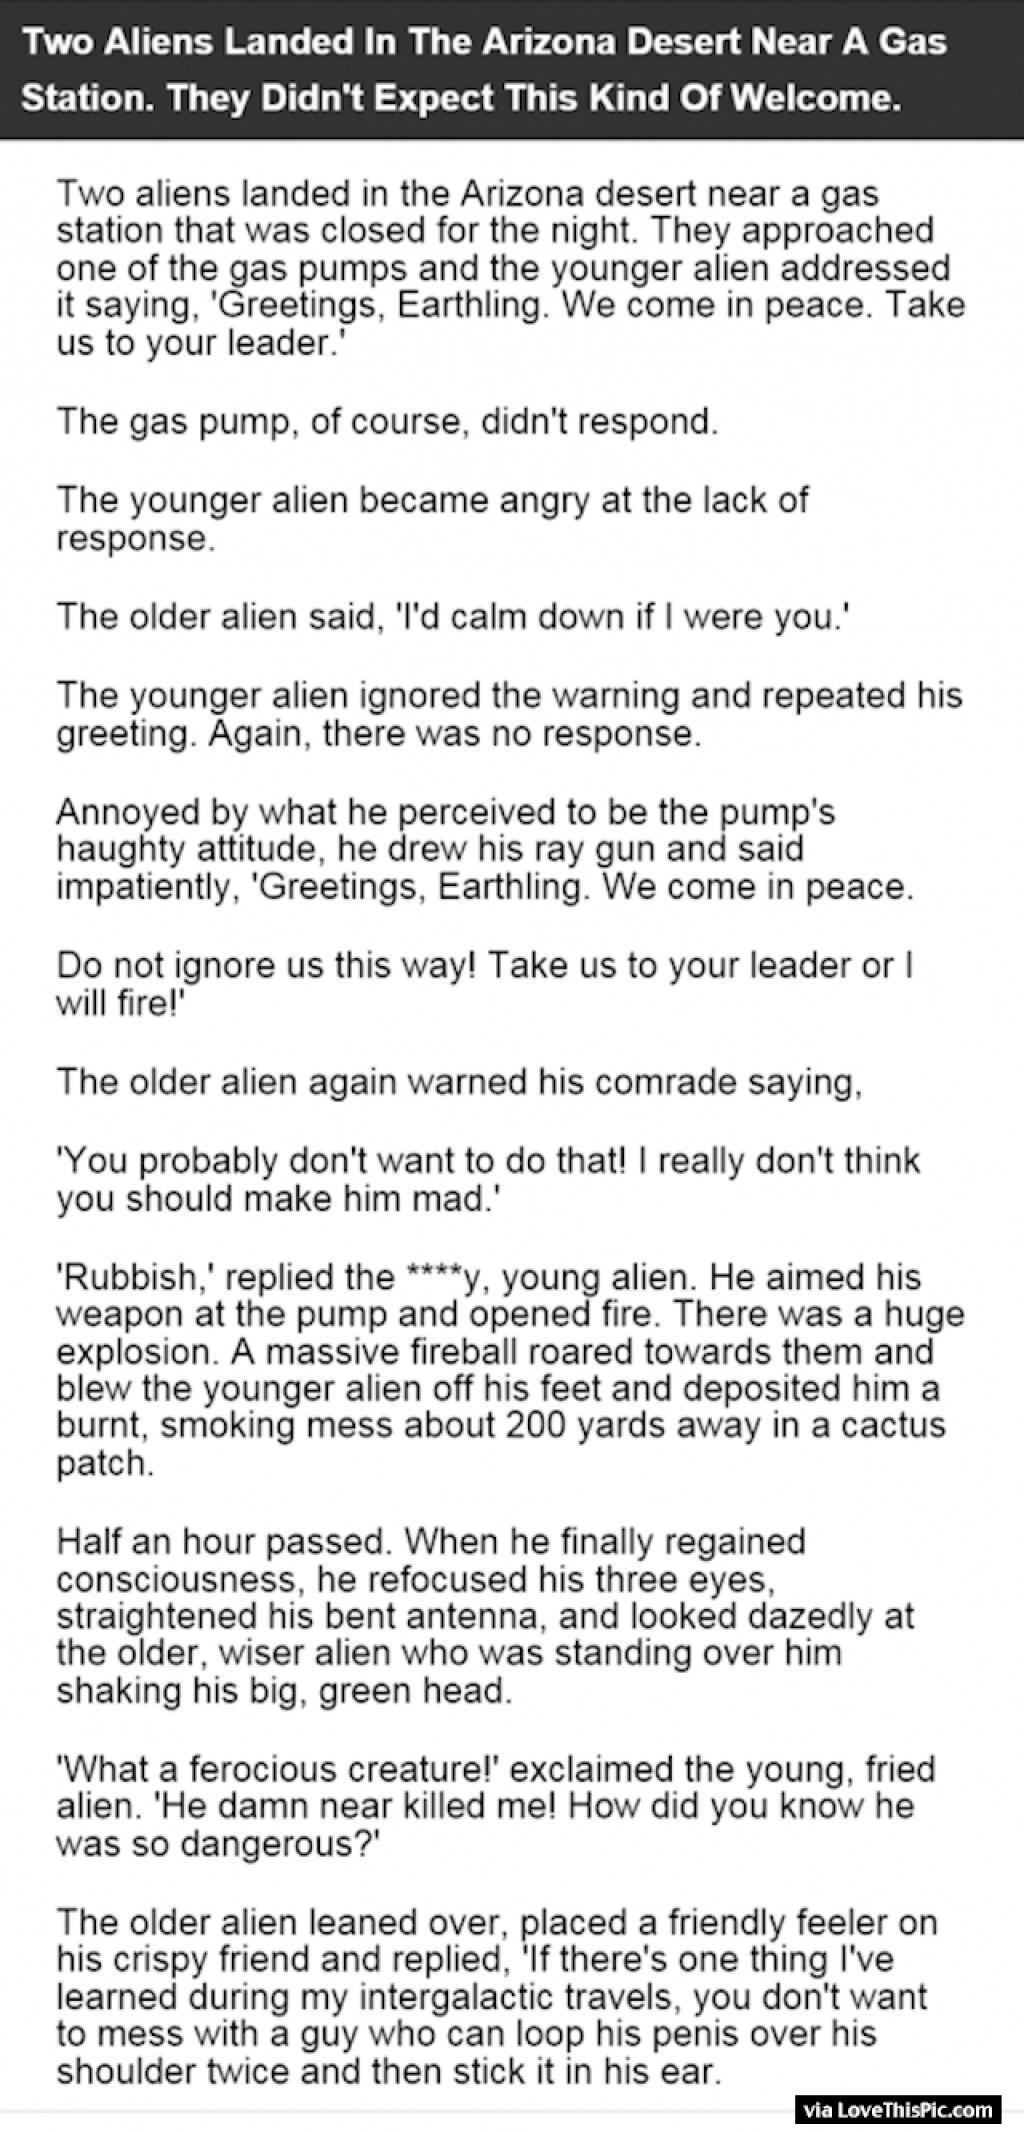 002 Essay On Aliens In Earth Marvelous Large